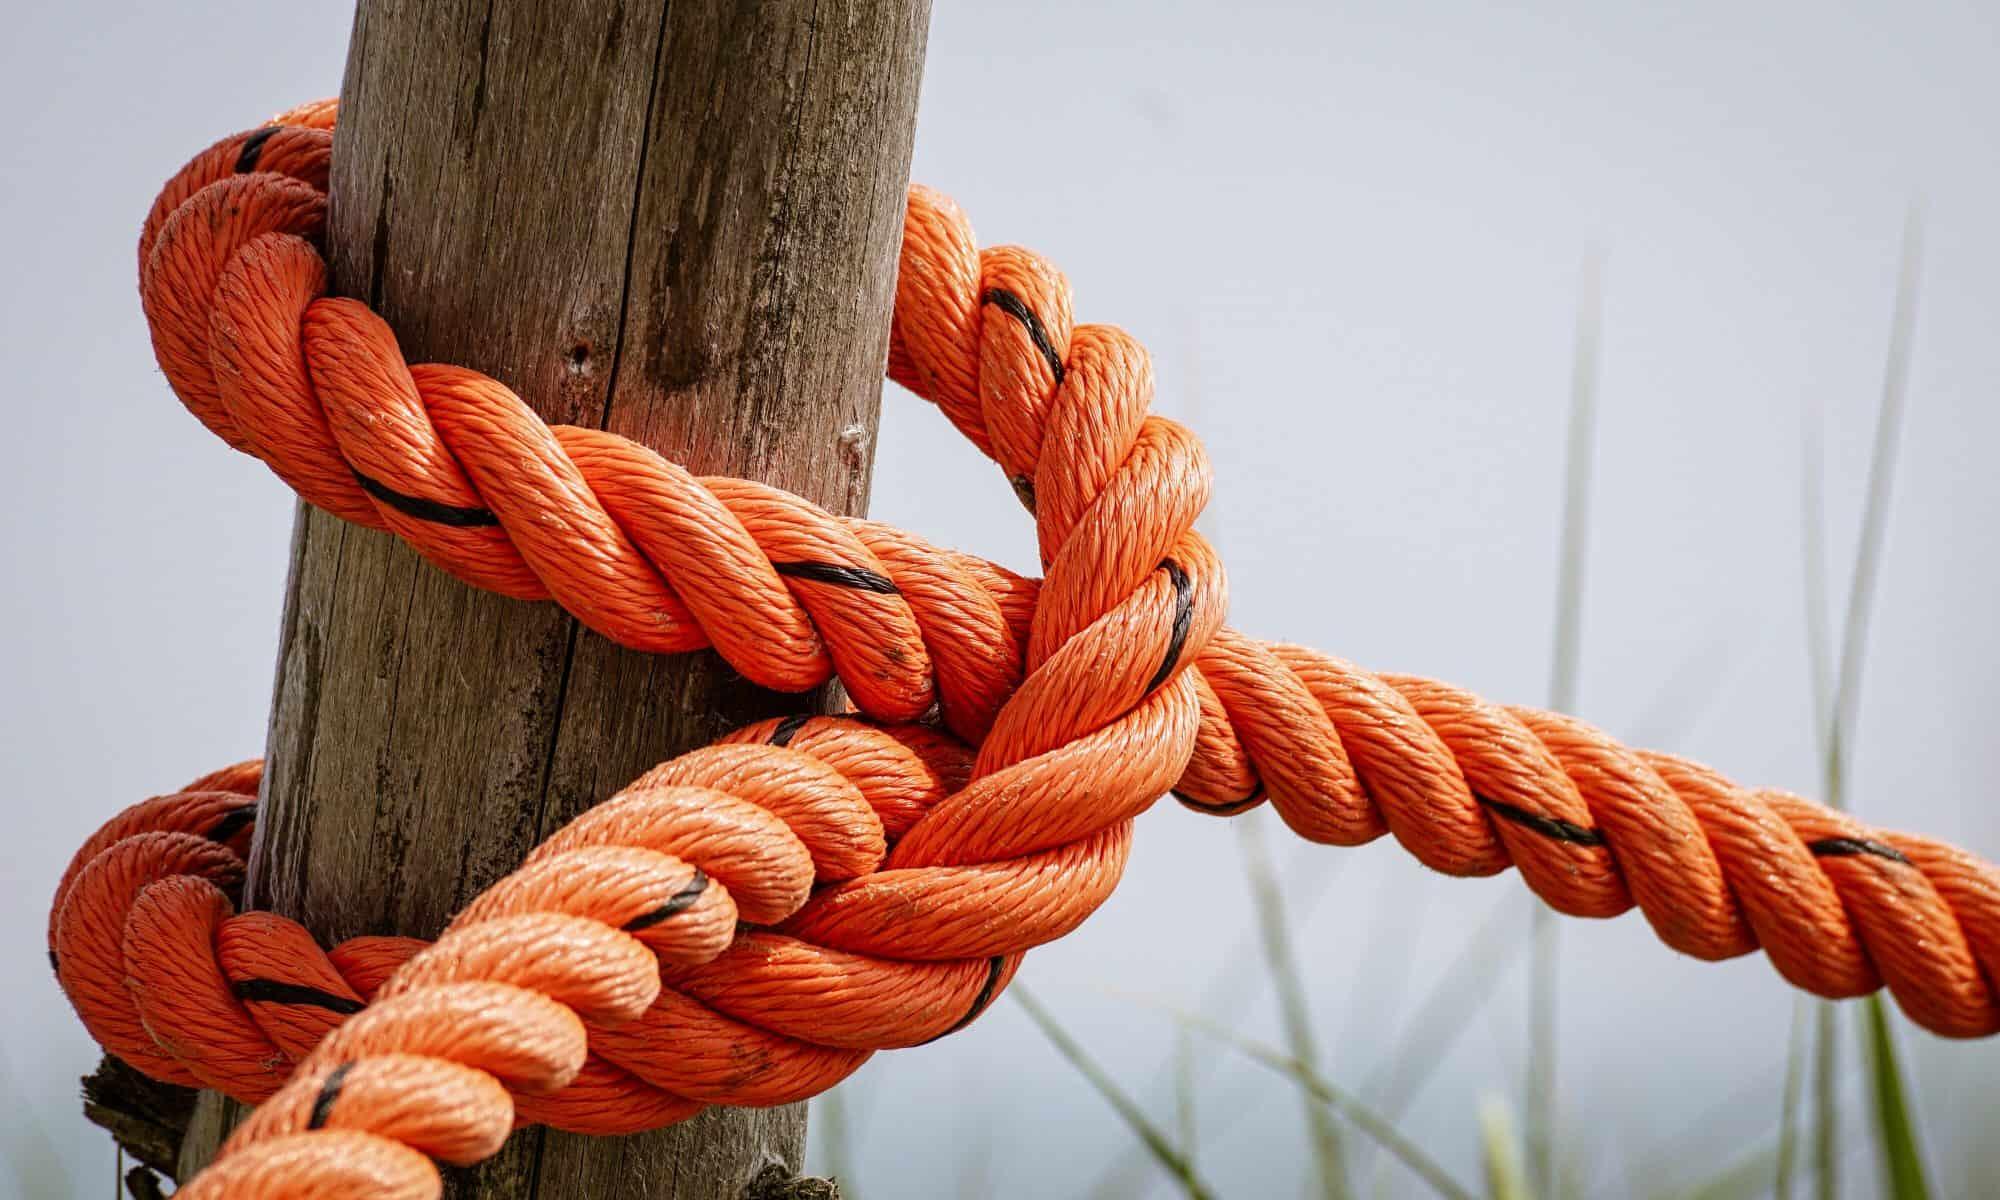 Rope image